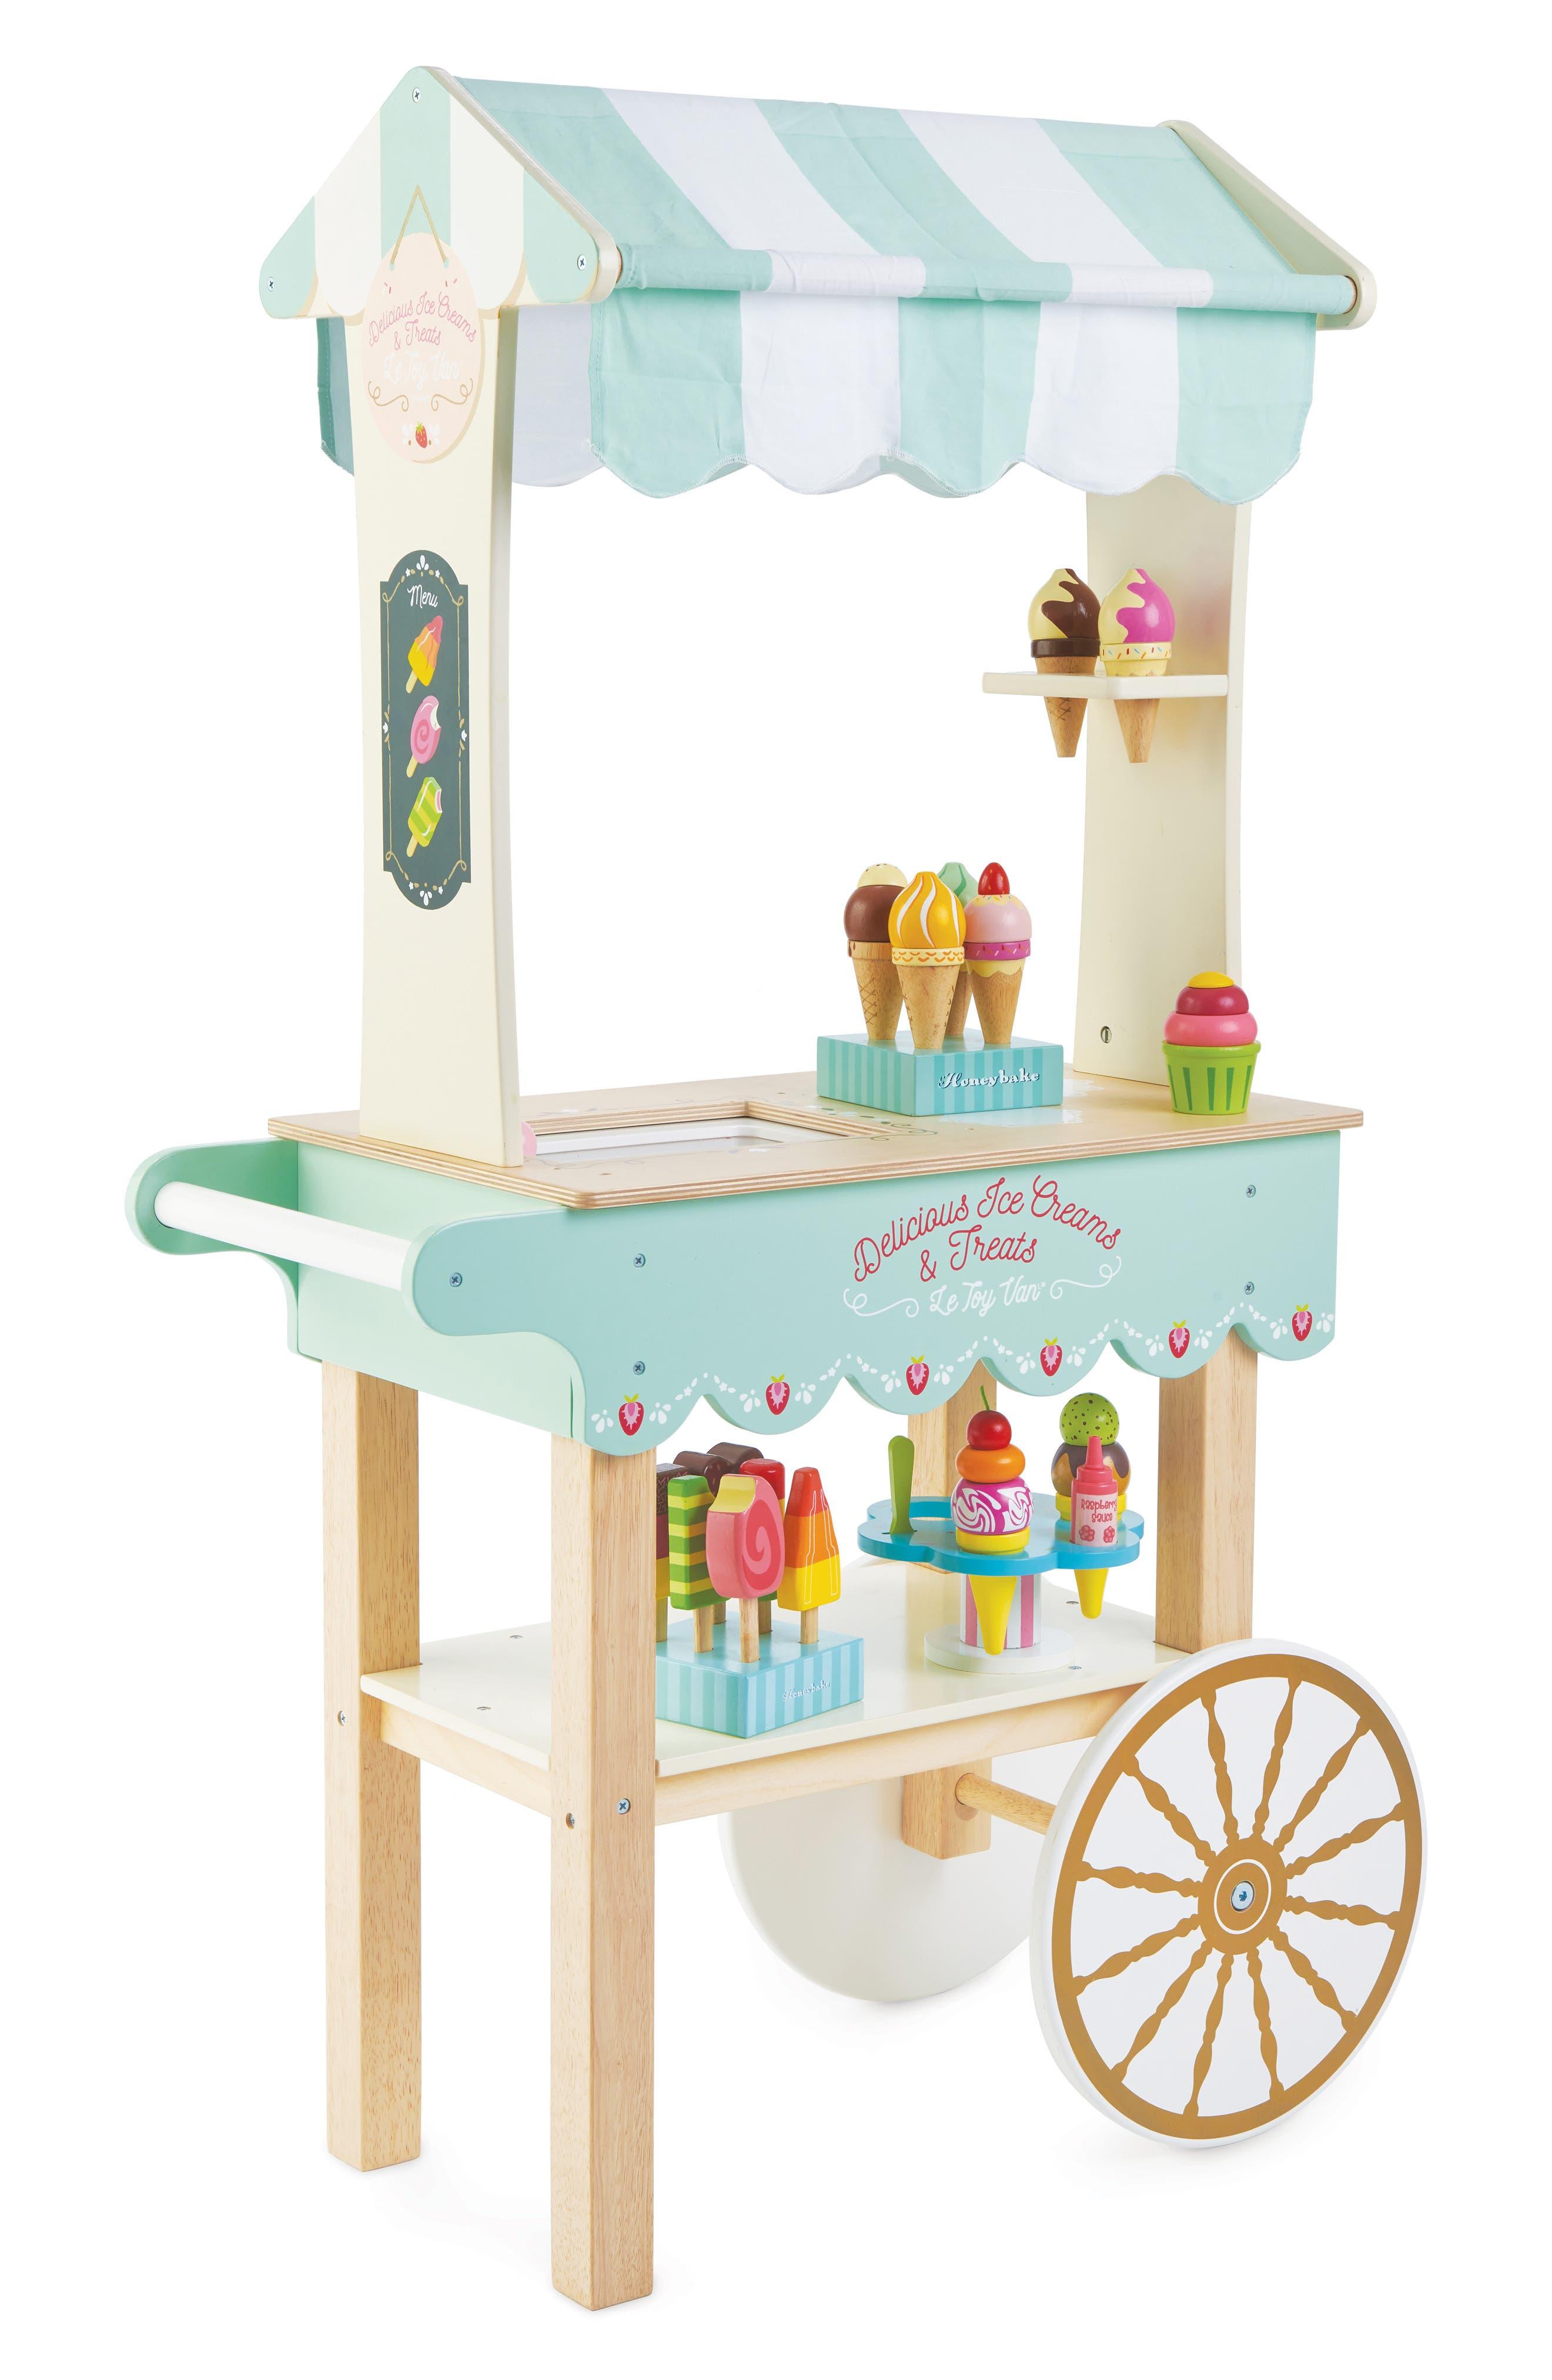 Le Toy Van Girl's Le Toy Van Ice Cream Trolley Toy Set